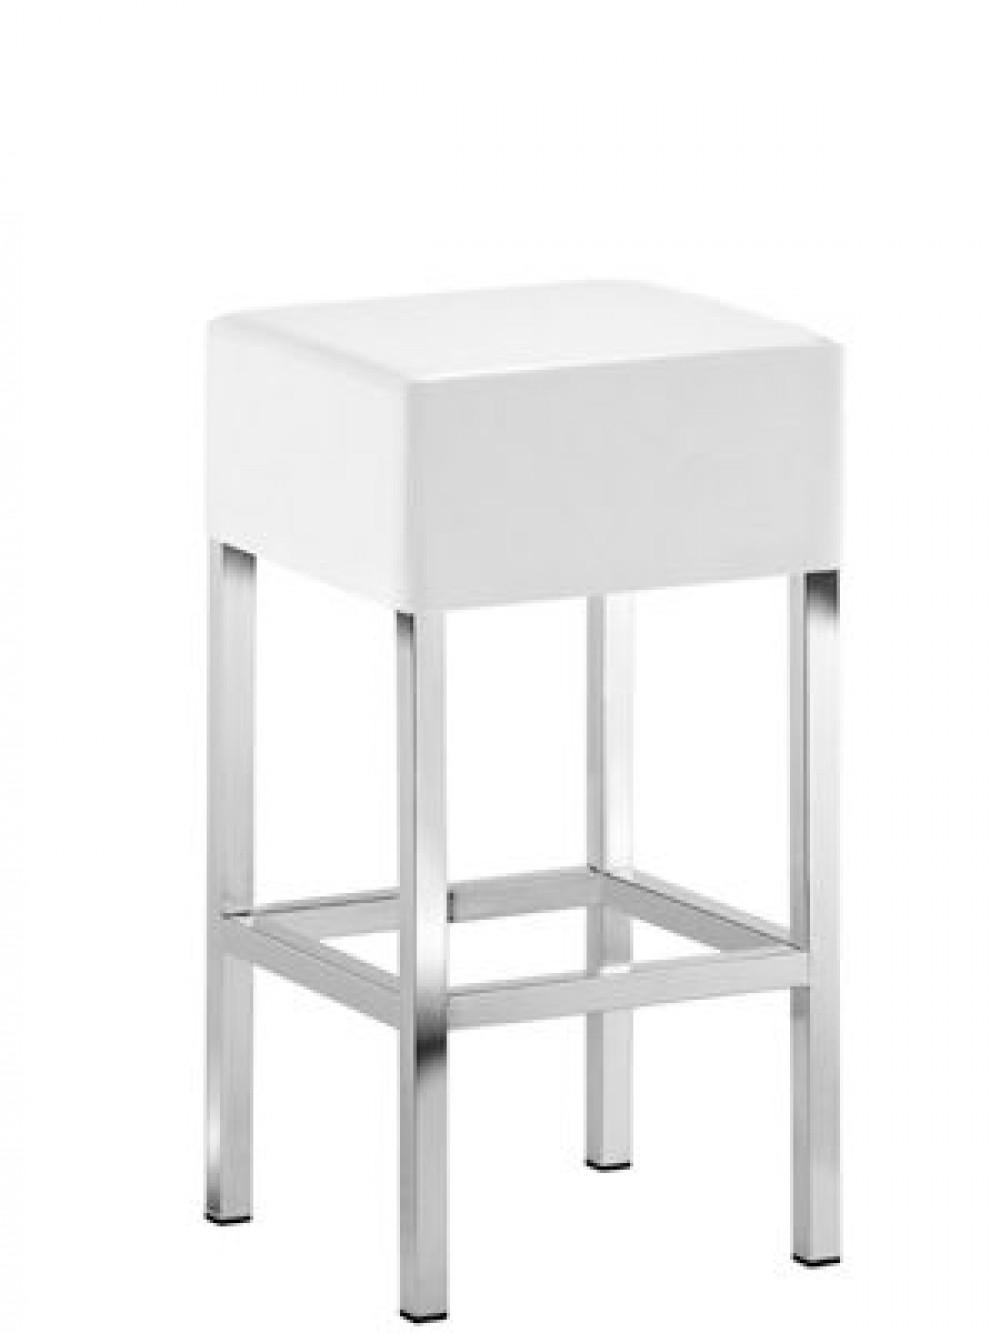 design barhocker mit verchromten gestell tresenhocker gepolstert wei sitzh he 65 cm. Black Bedroom Furniture Sets. Home Design Ideas